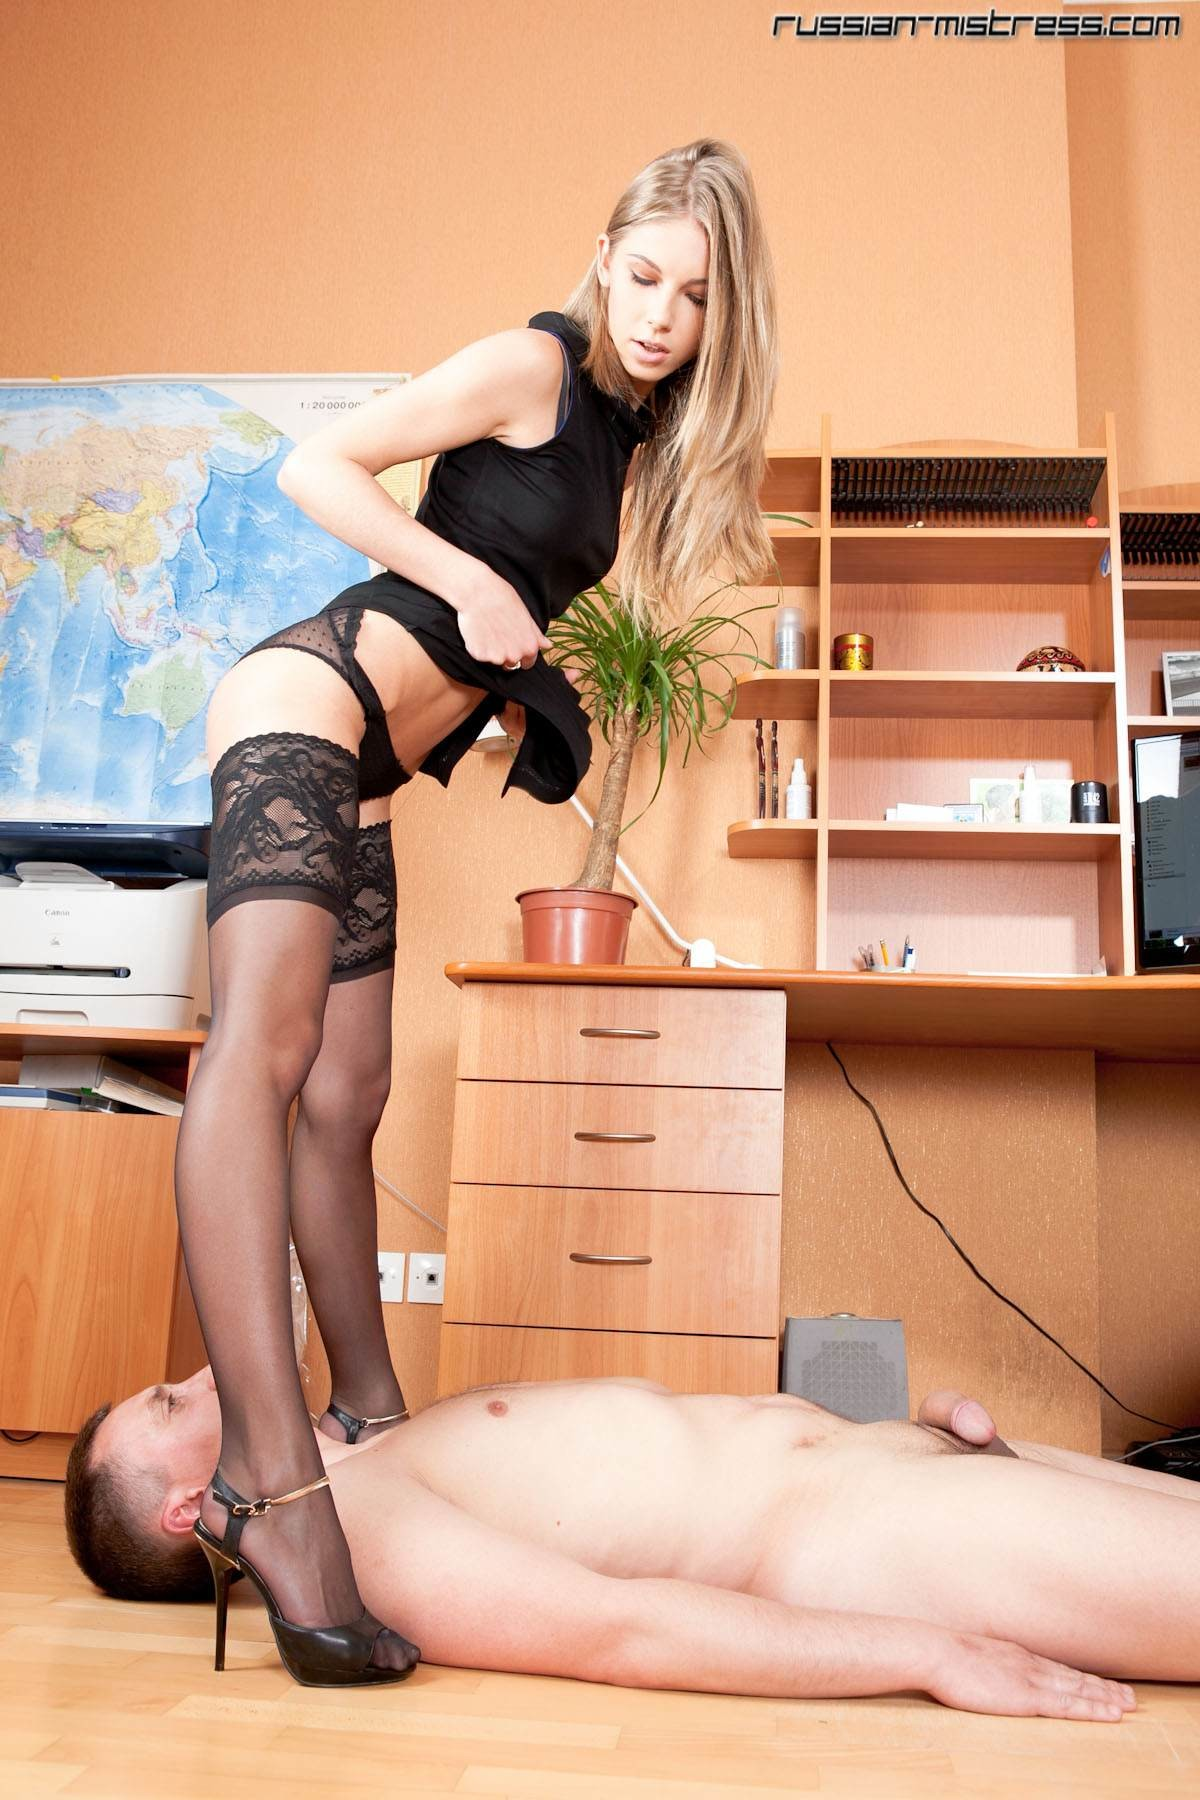 russian-bossy-lady-2